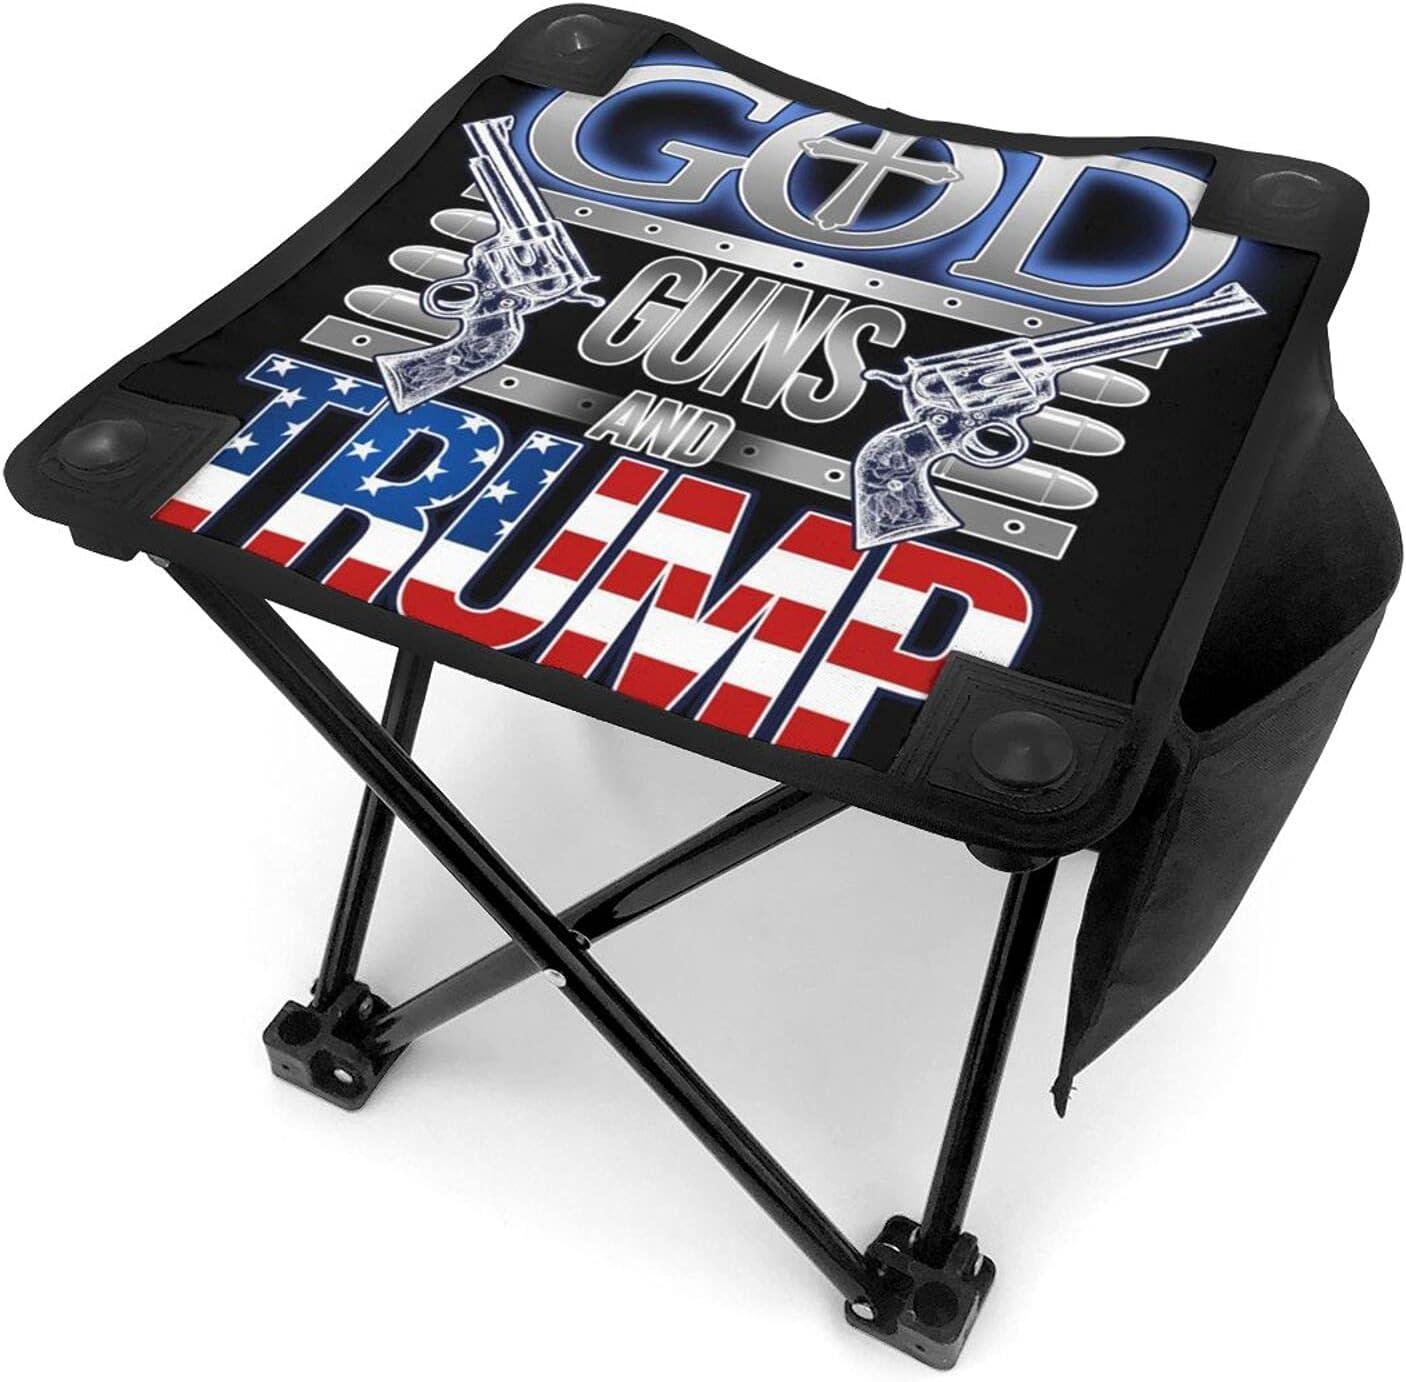 God Guns and Trump Slacker Chair for Fishing Outdoor Travelchair